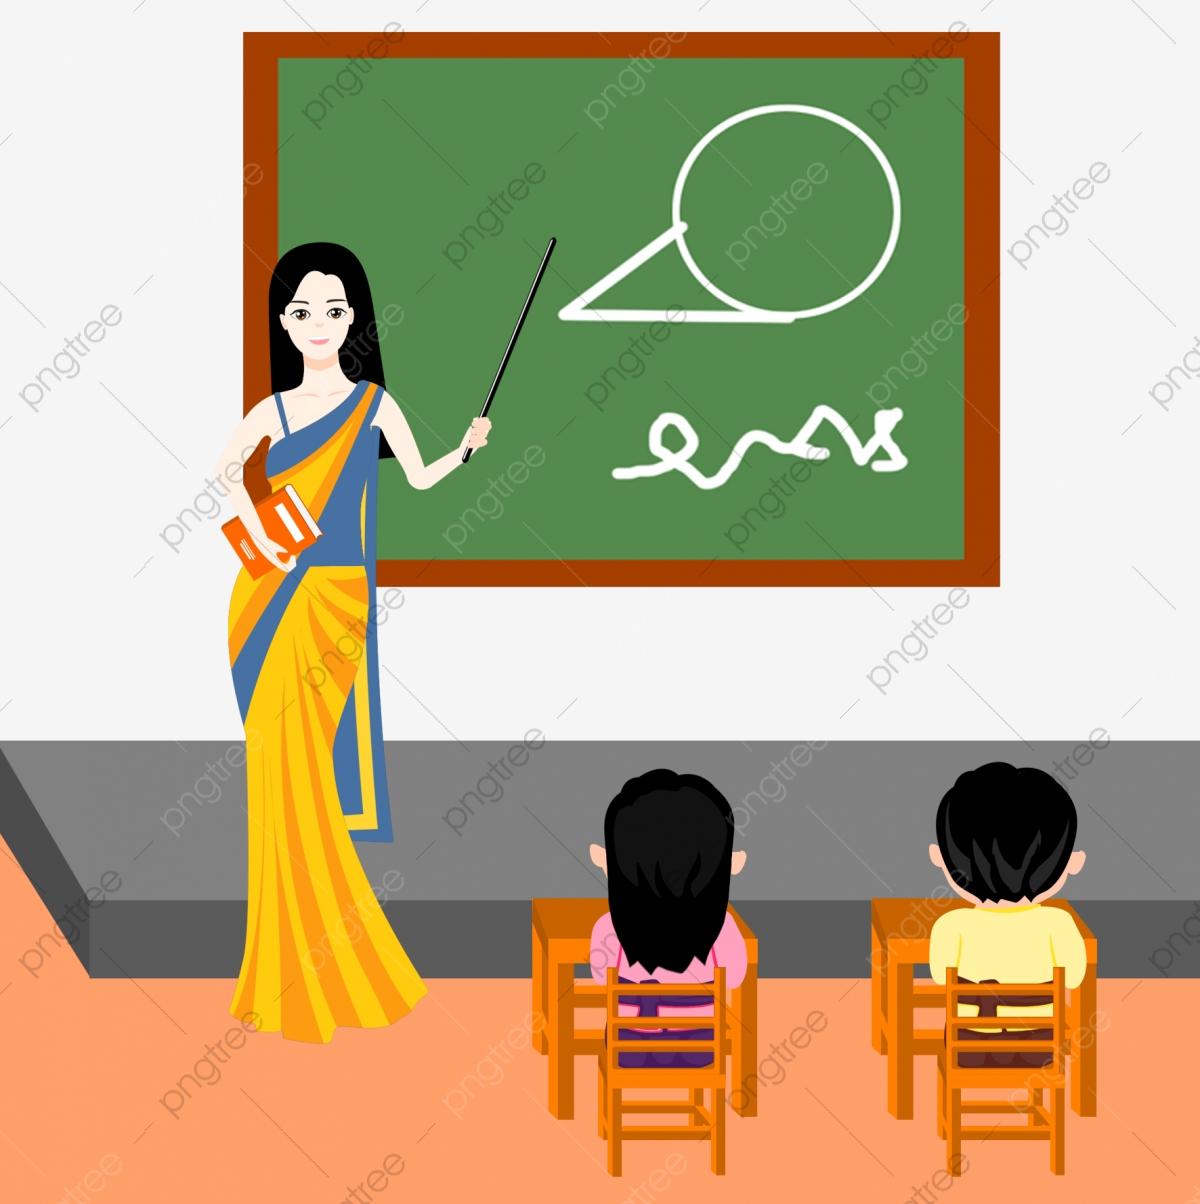 Teaching Teacher Teaching Students, Teaching, The Teacher.